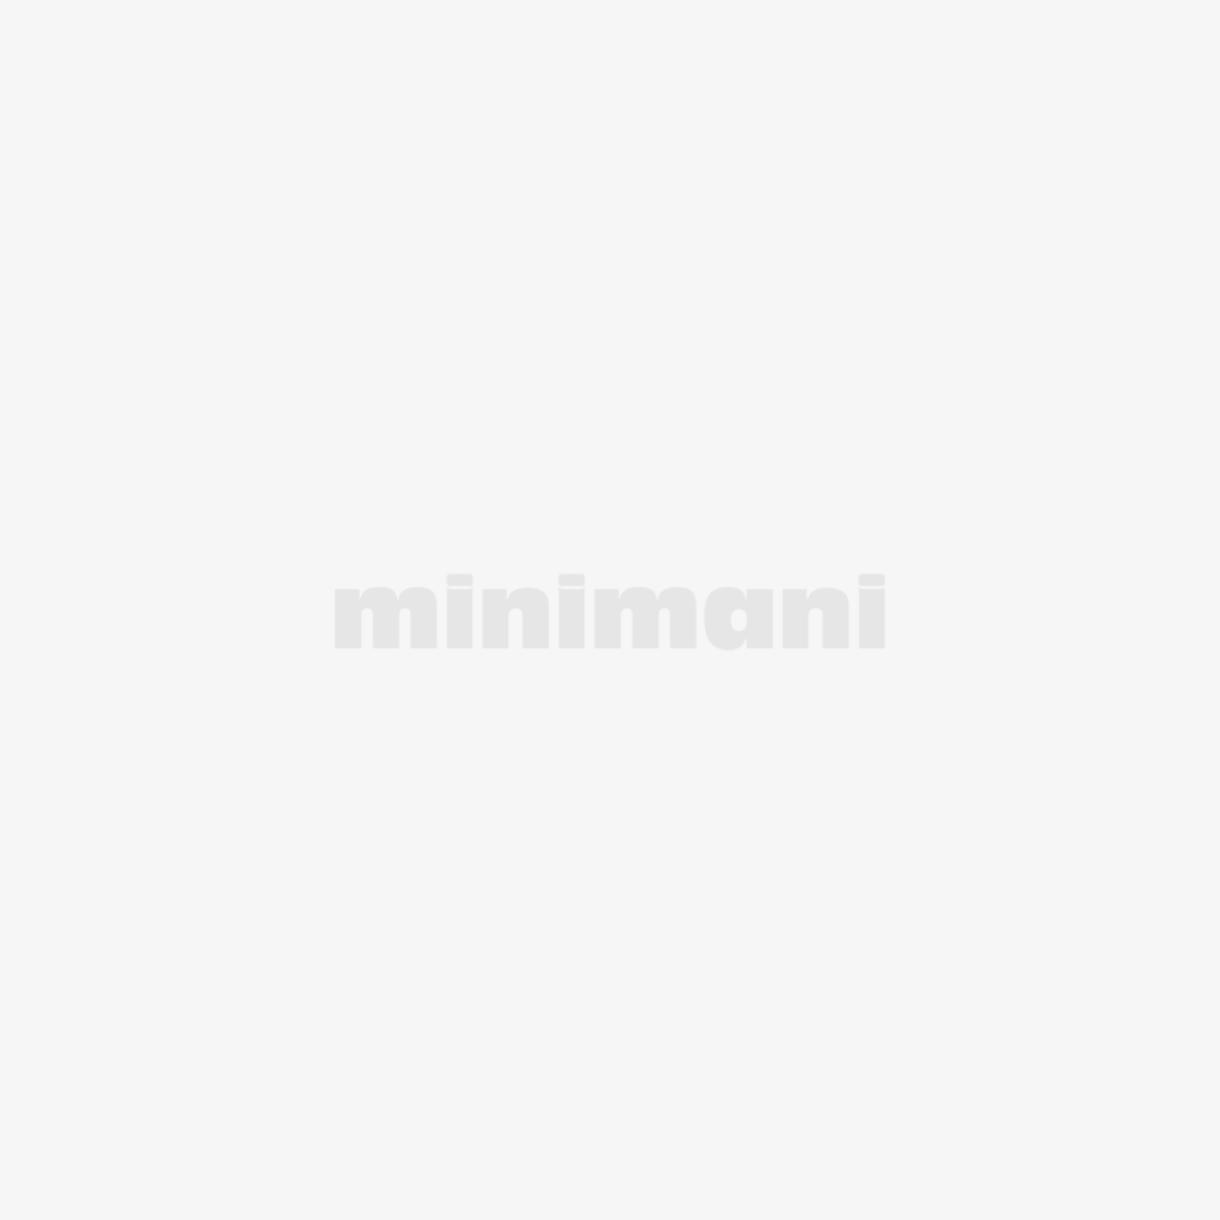 Finlayson satiinipussilakanasetti 150x210+50x60cm, Loitsu musta/harmaa